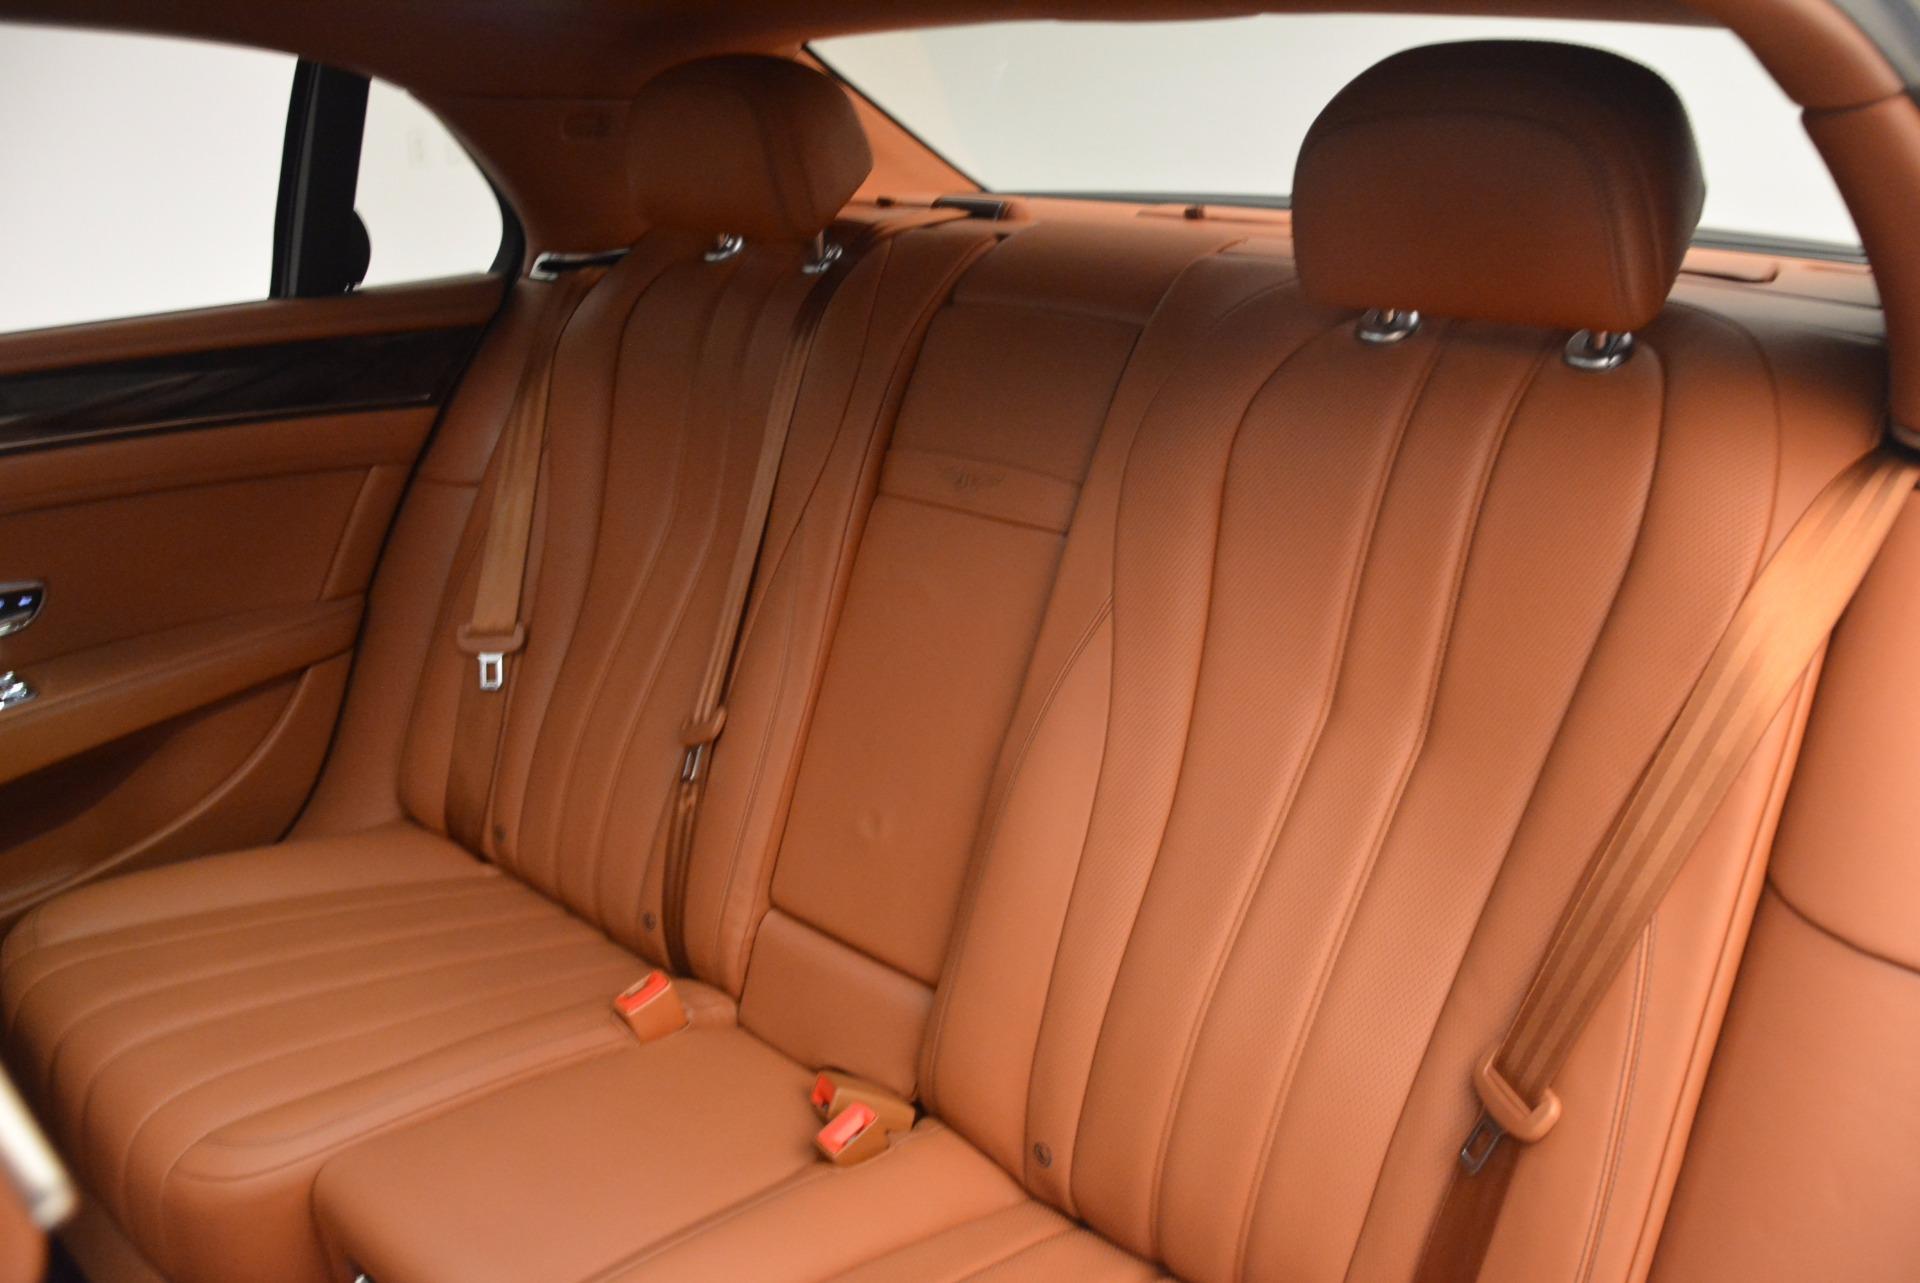 Used 2014 Bentley Flying Spur W12 For Sale In Westport, CT 1598_p34